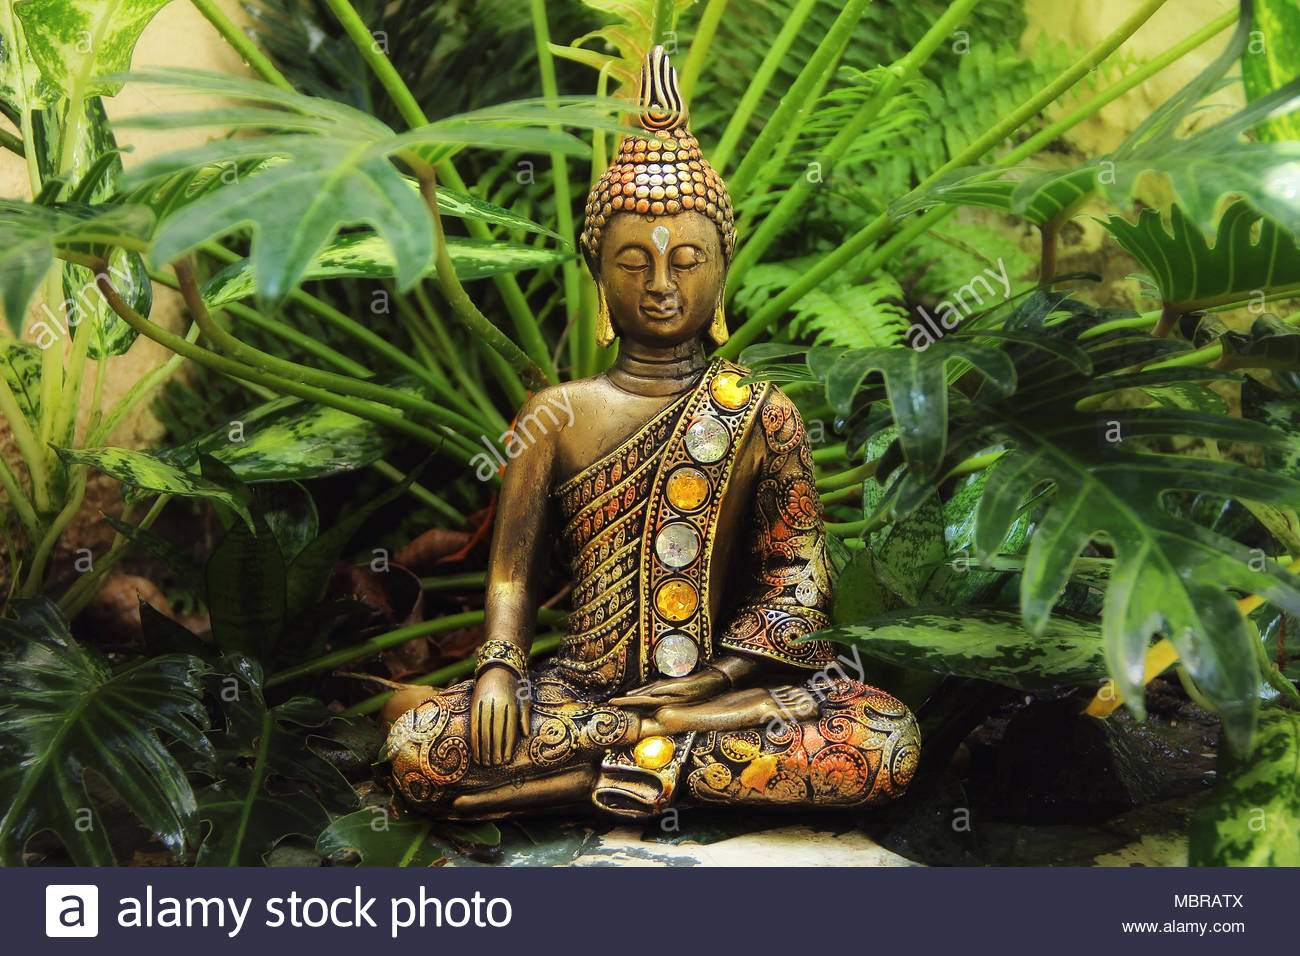 Siddhartha Gautama Stock Photos Siddhartha Gautama Stock Images 1300x956